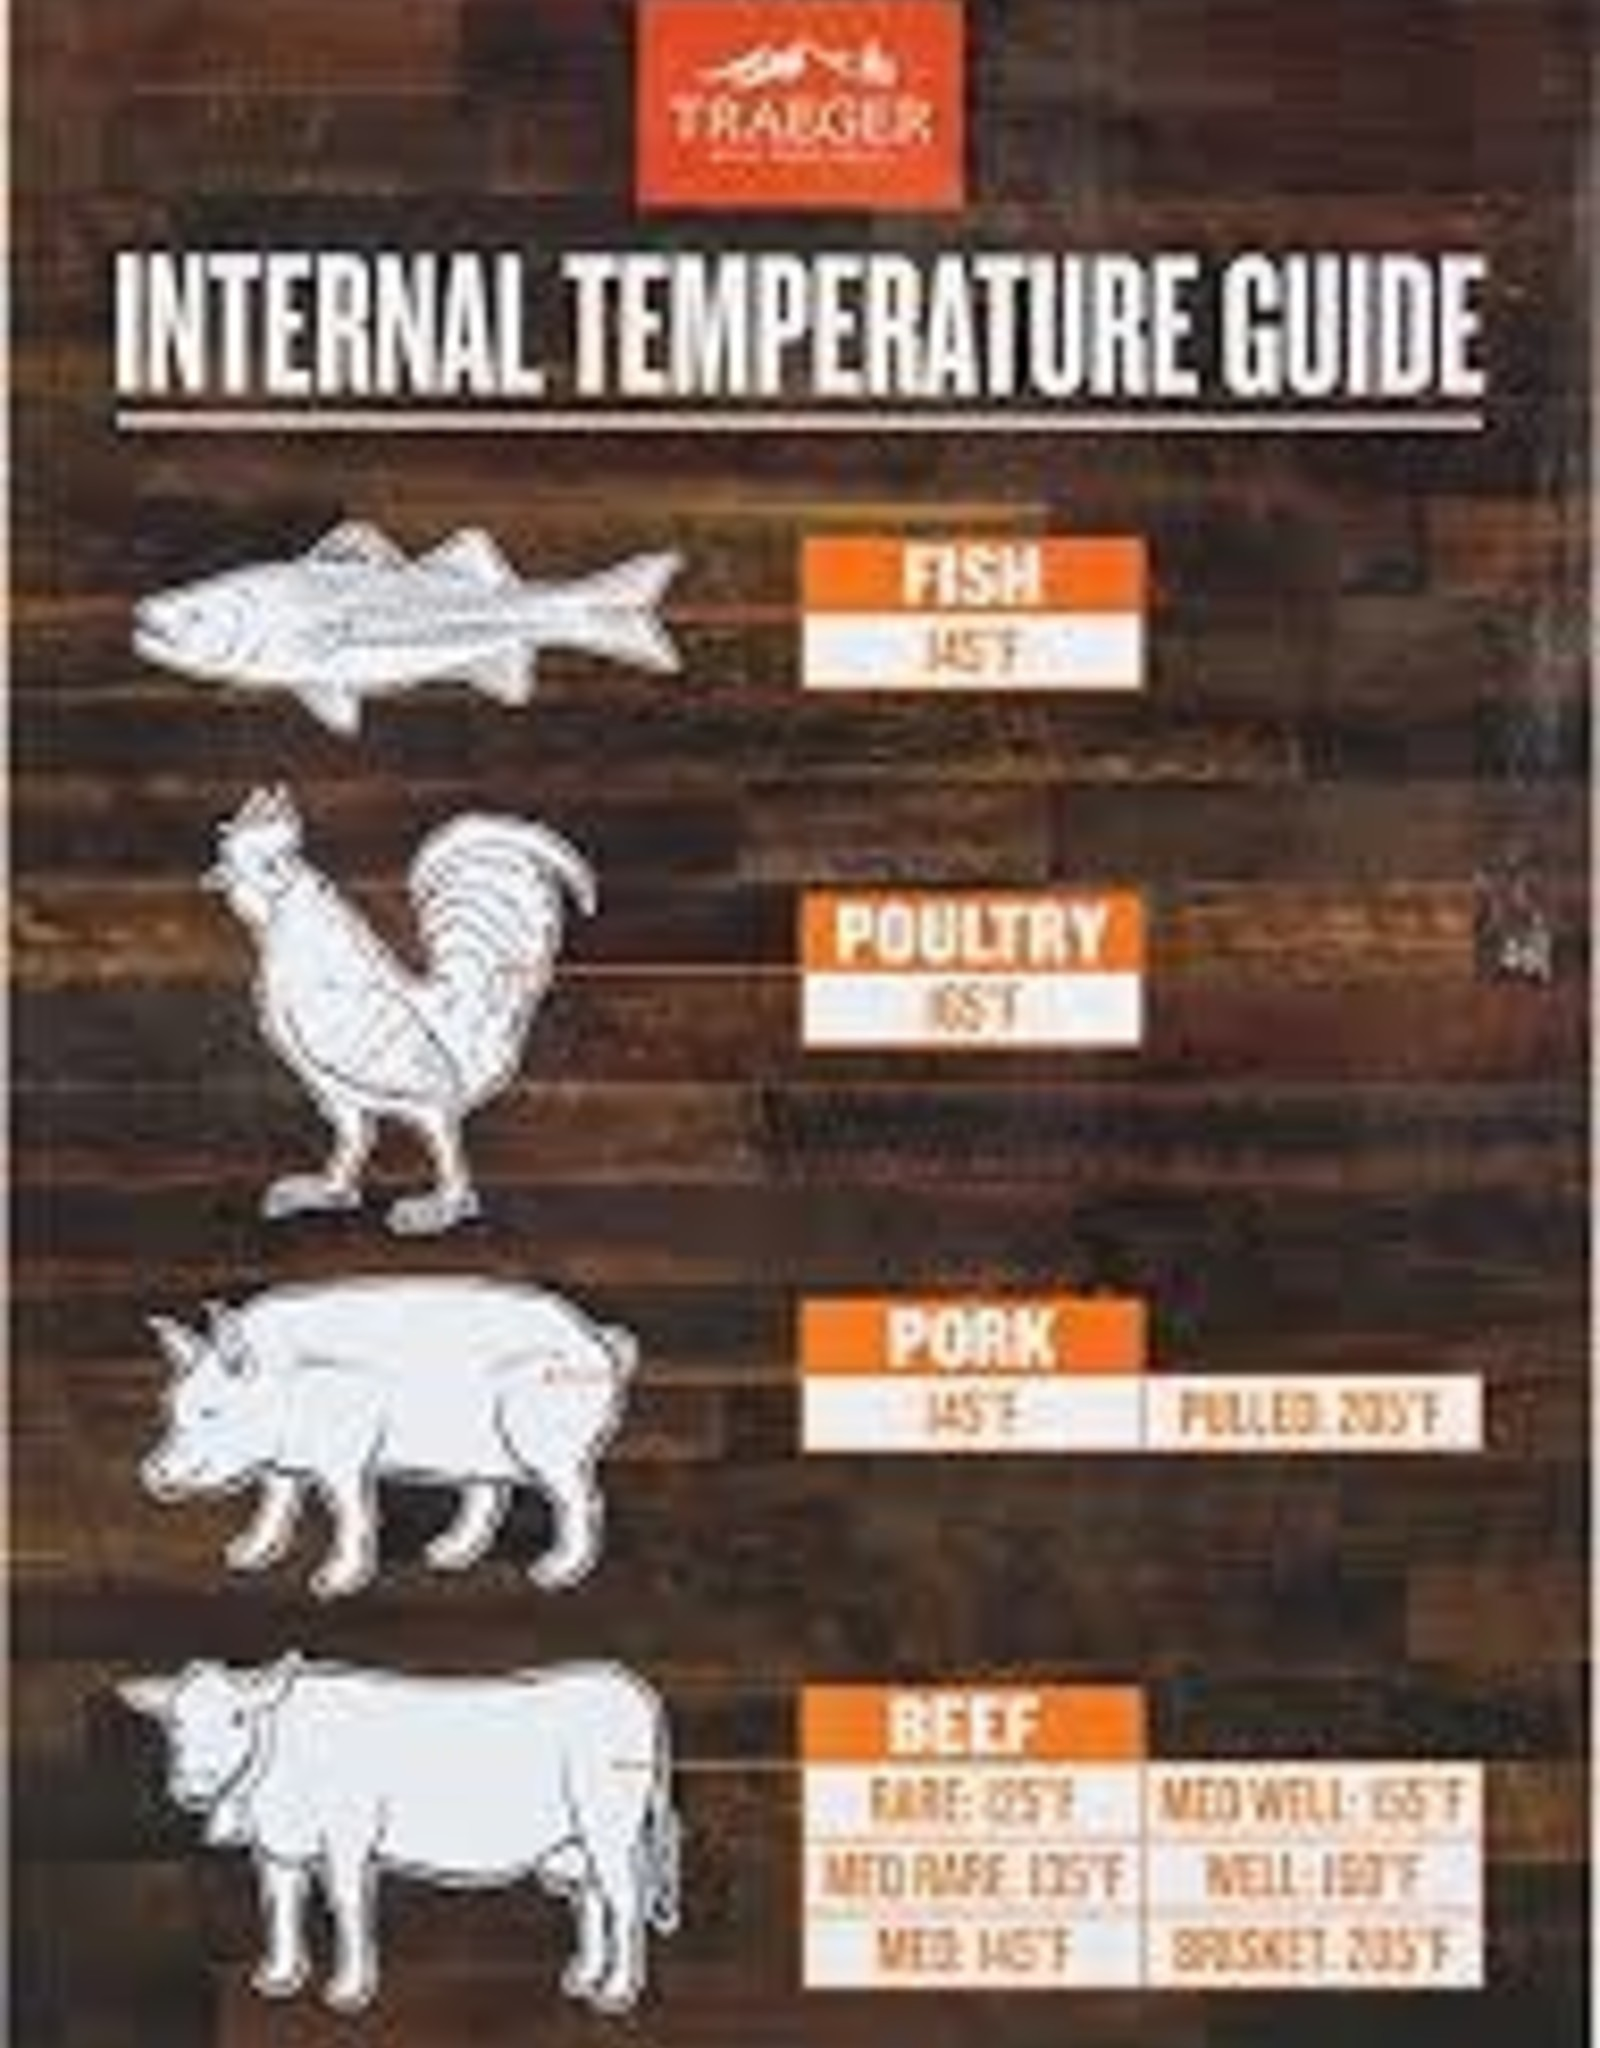 Traeger Traeger Internal Temperature Guide Grill Magnet - BAC462